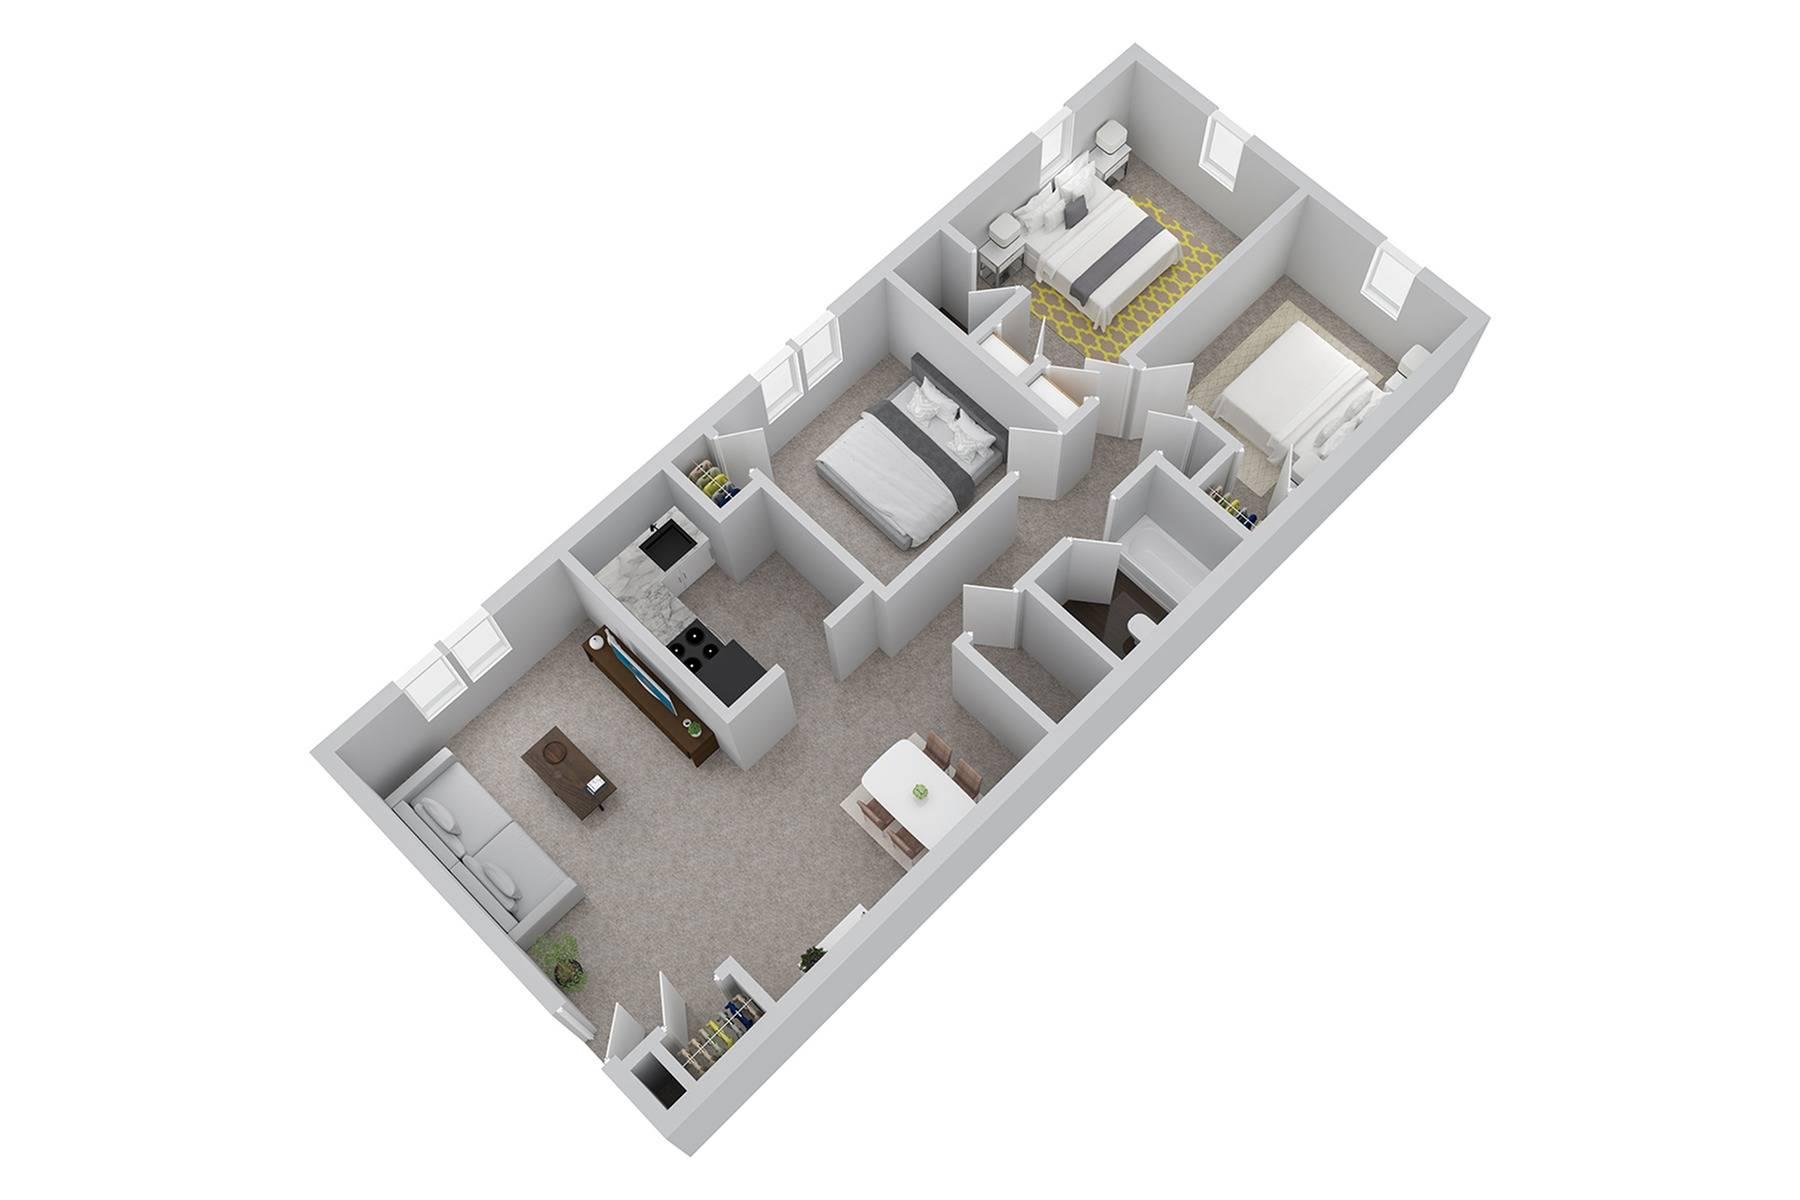 3 Bdrm Floor Plan | Luxury Newark Apartments | Hunters Crossing